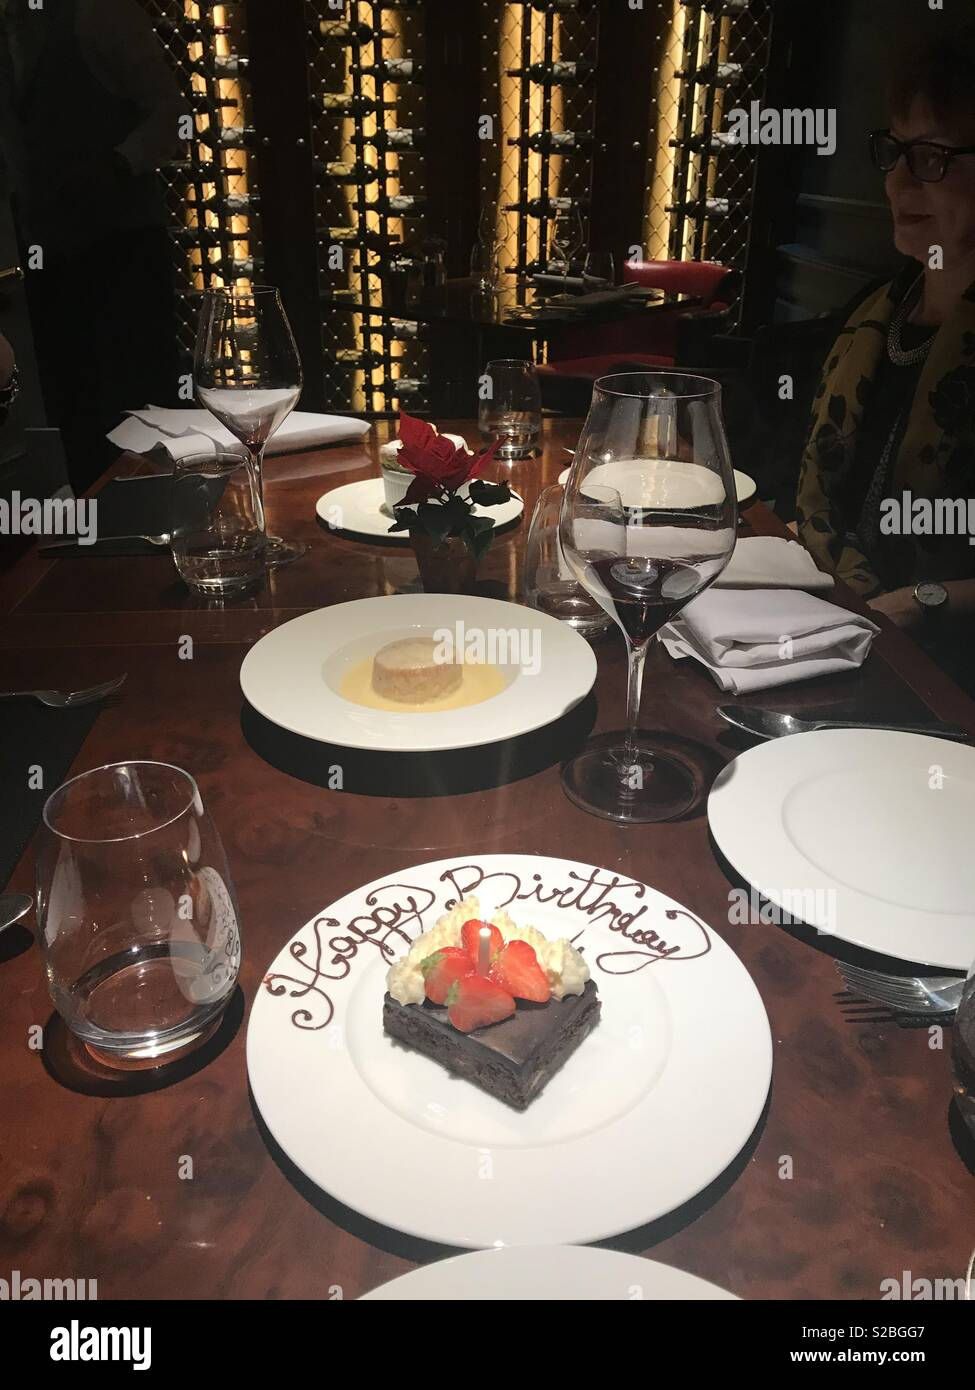 Happy Birthday Chocolate Slice Restaurant Gift